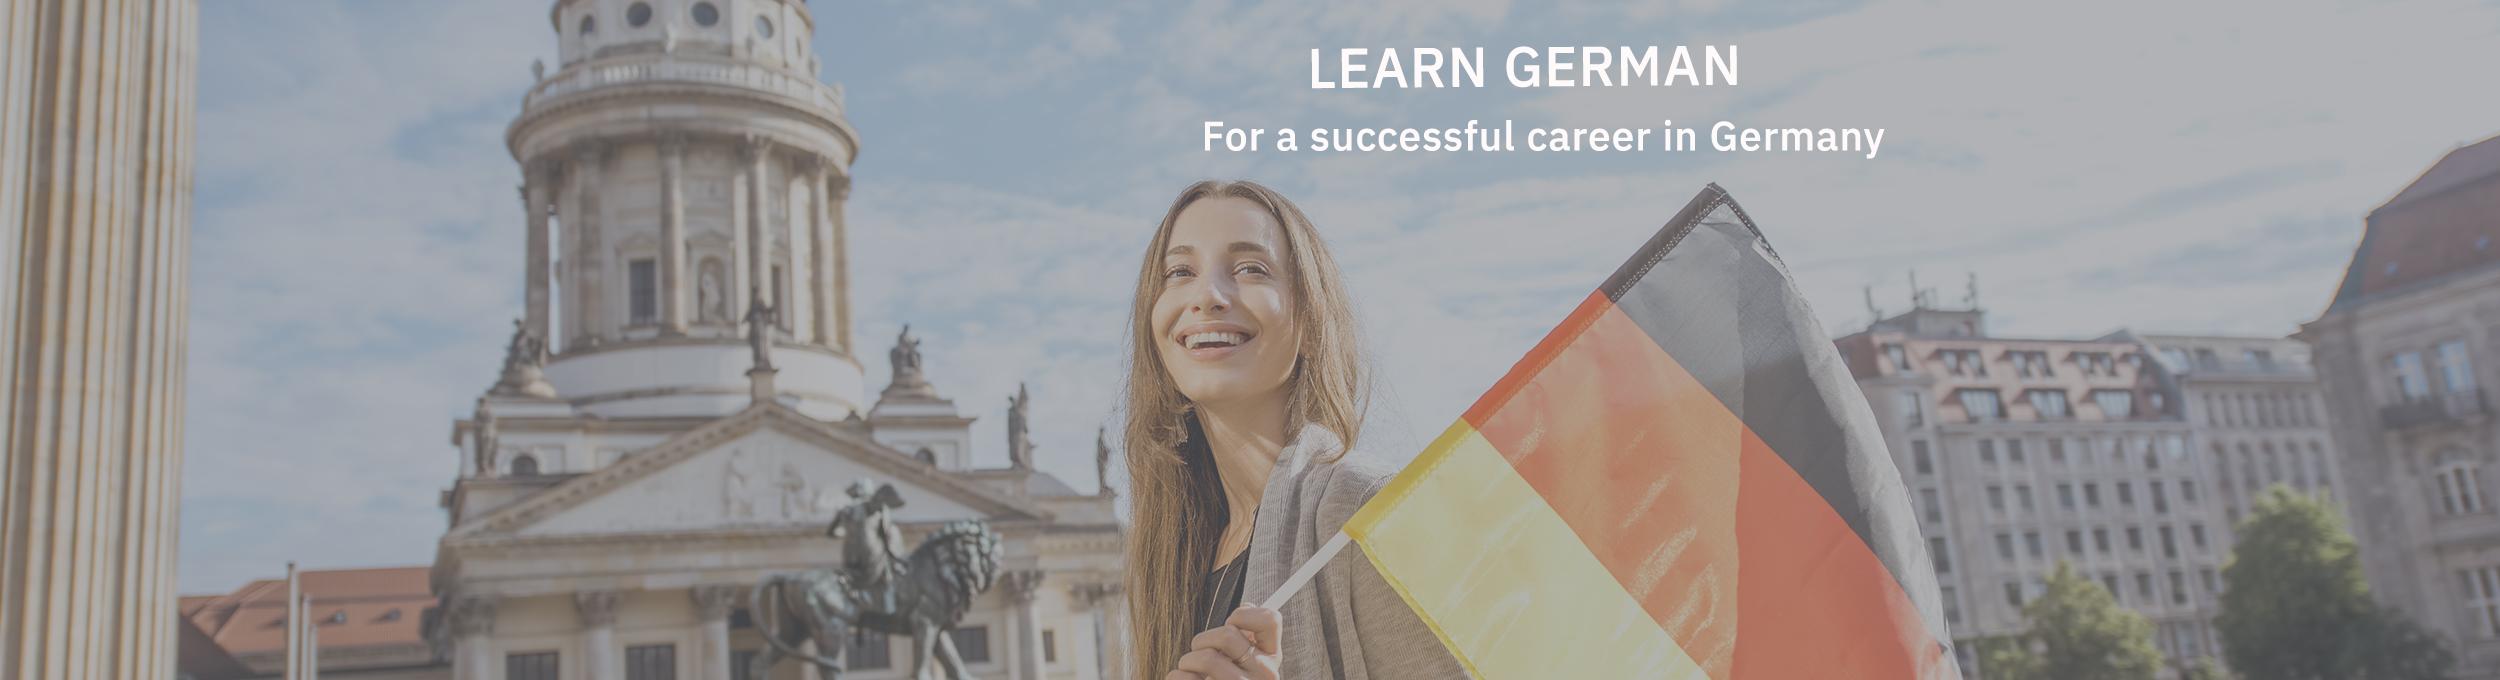 learn-germanhome